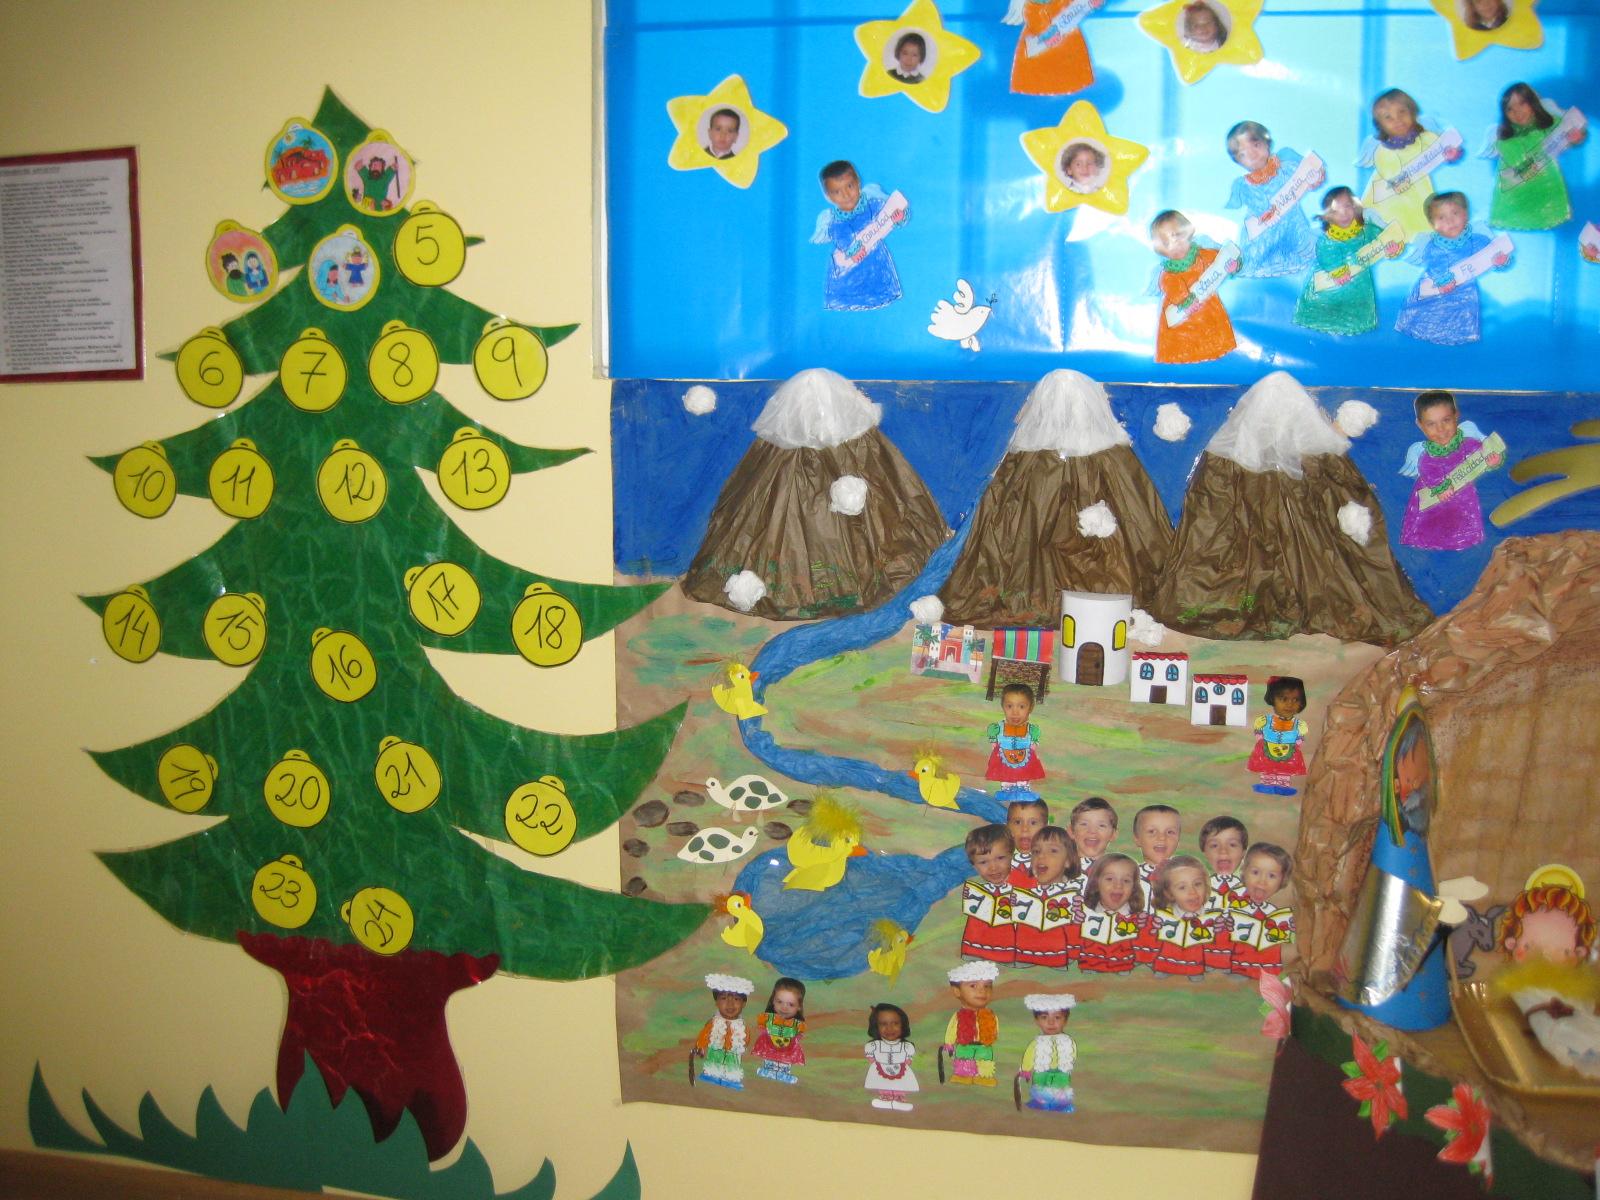 Mural de navidad recurso educativo 90771 tiching - Mural navidad infantil ...